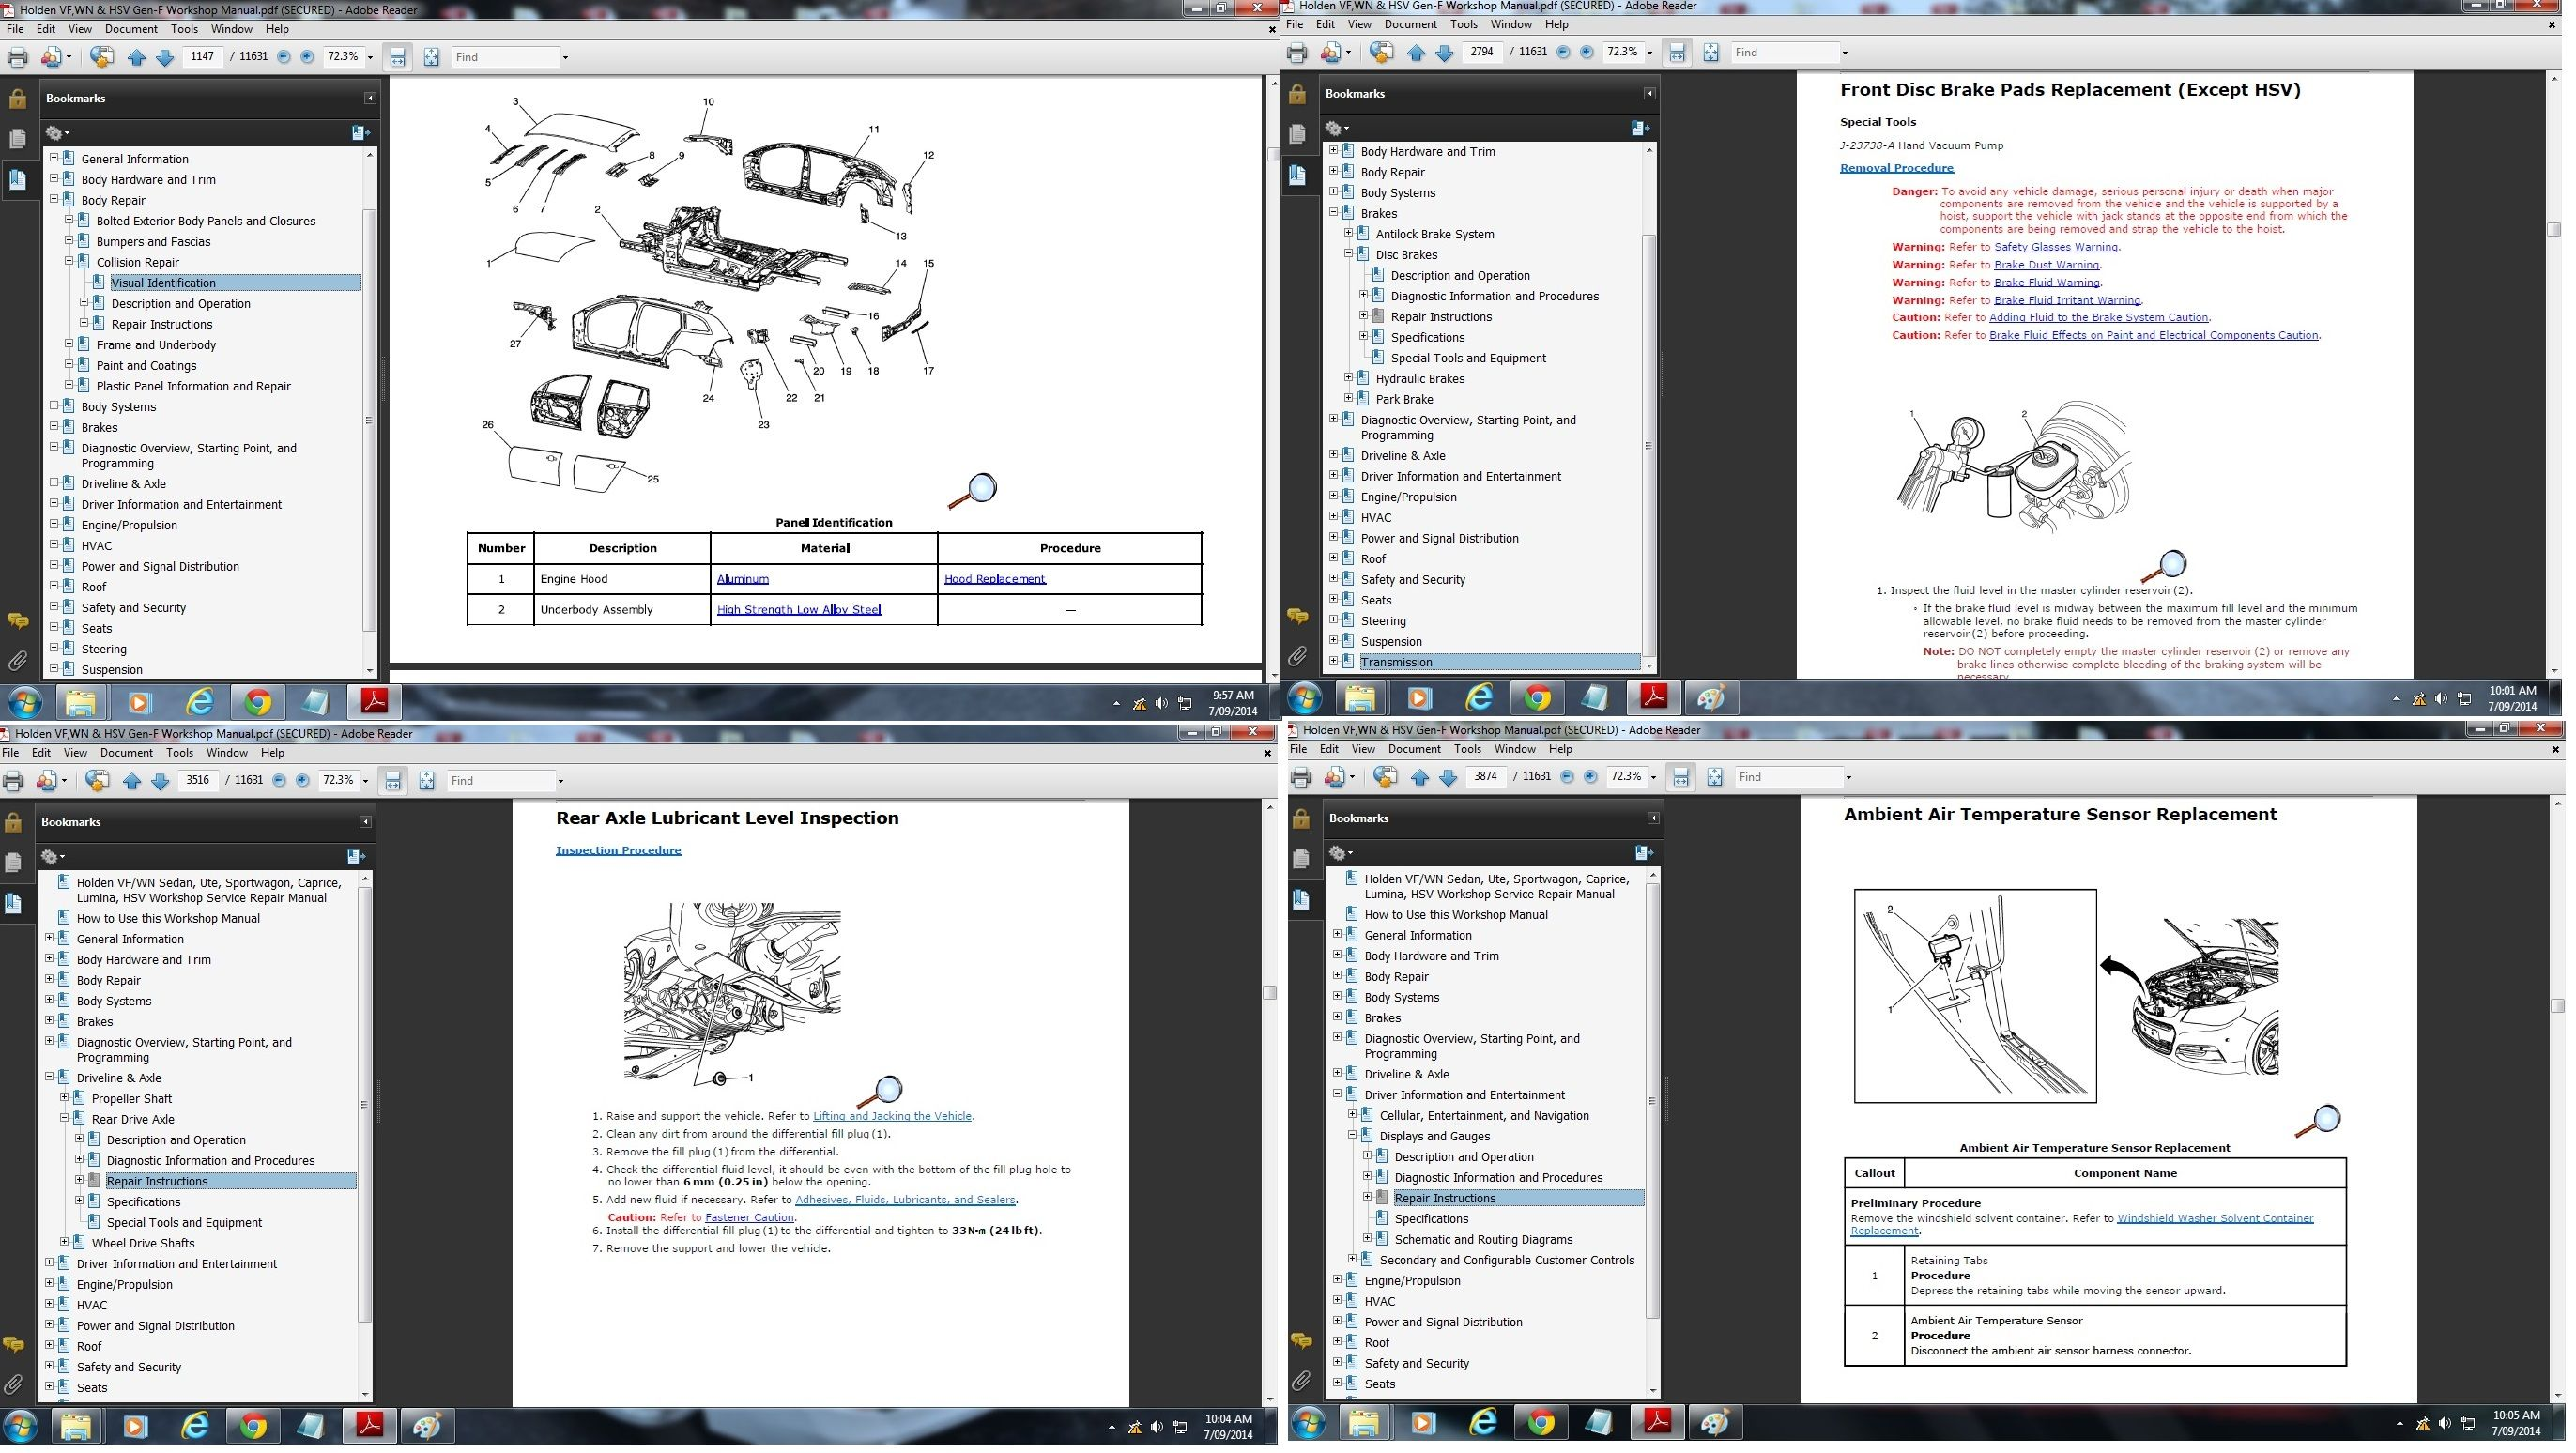 holden vf wn sedan ute sportwagon caprice hsv wor rh sellfy com commodore vz workshop manual free download holden vx workshop manual pdf